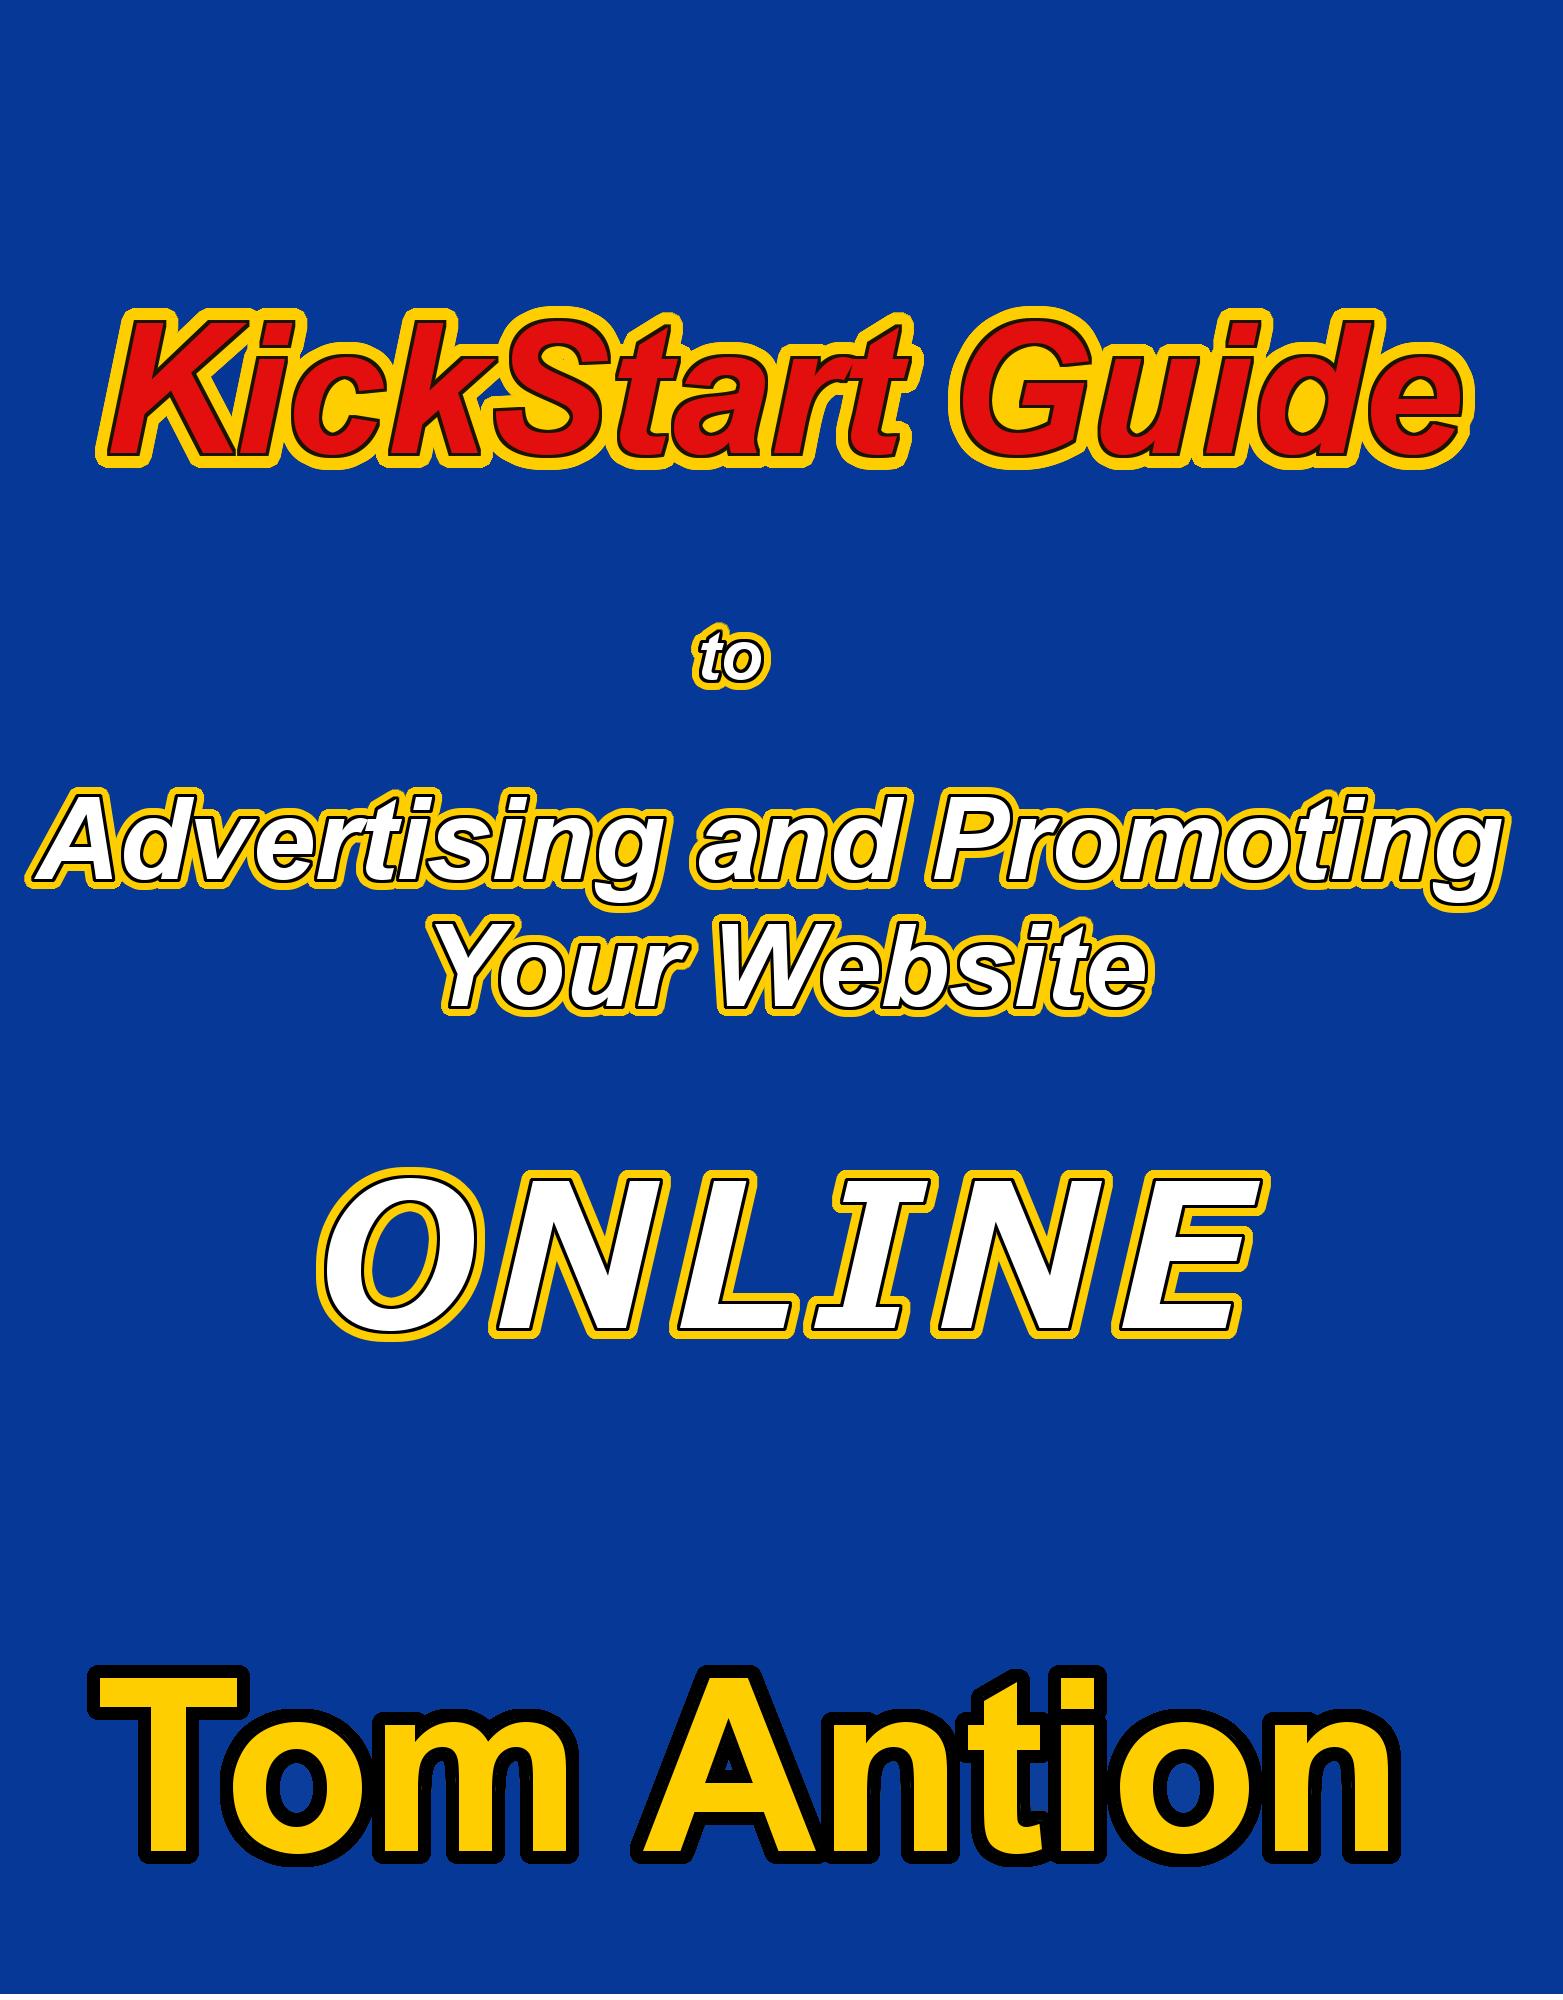 kickstart guide, promotion, advertising